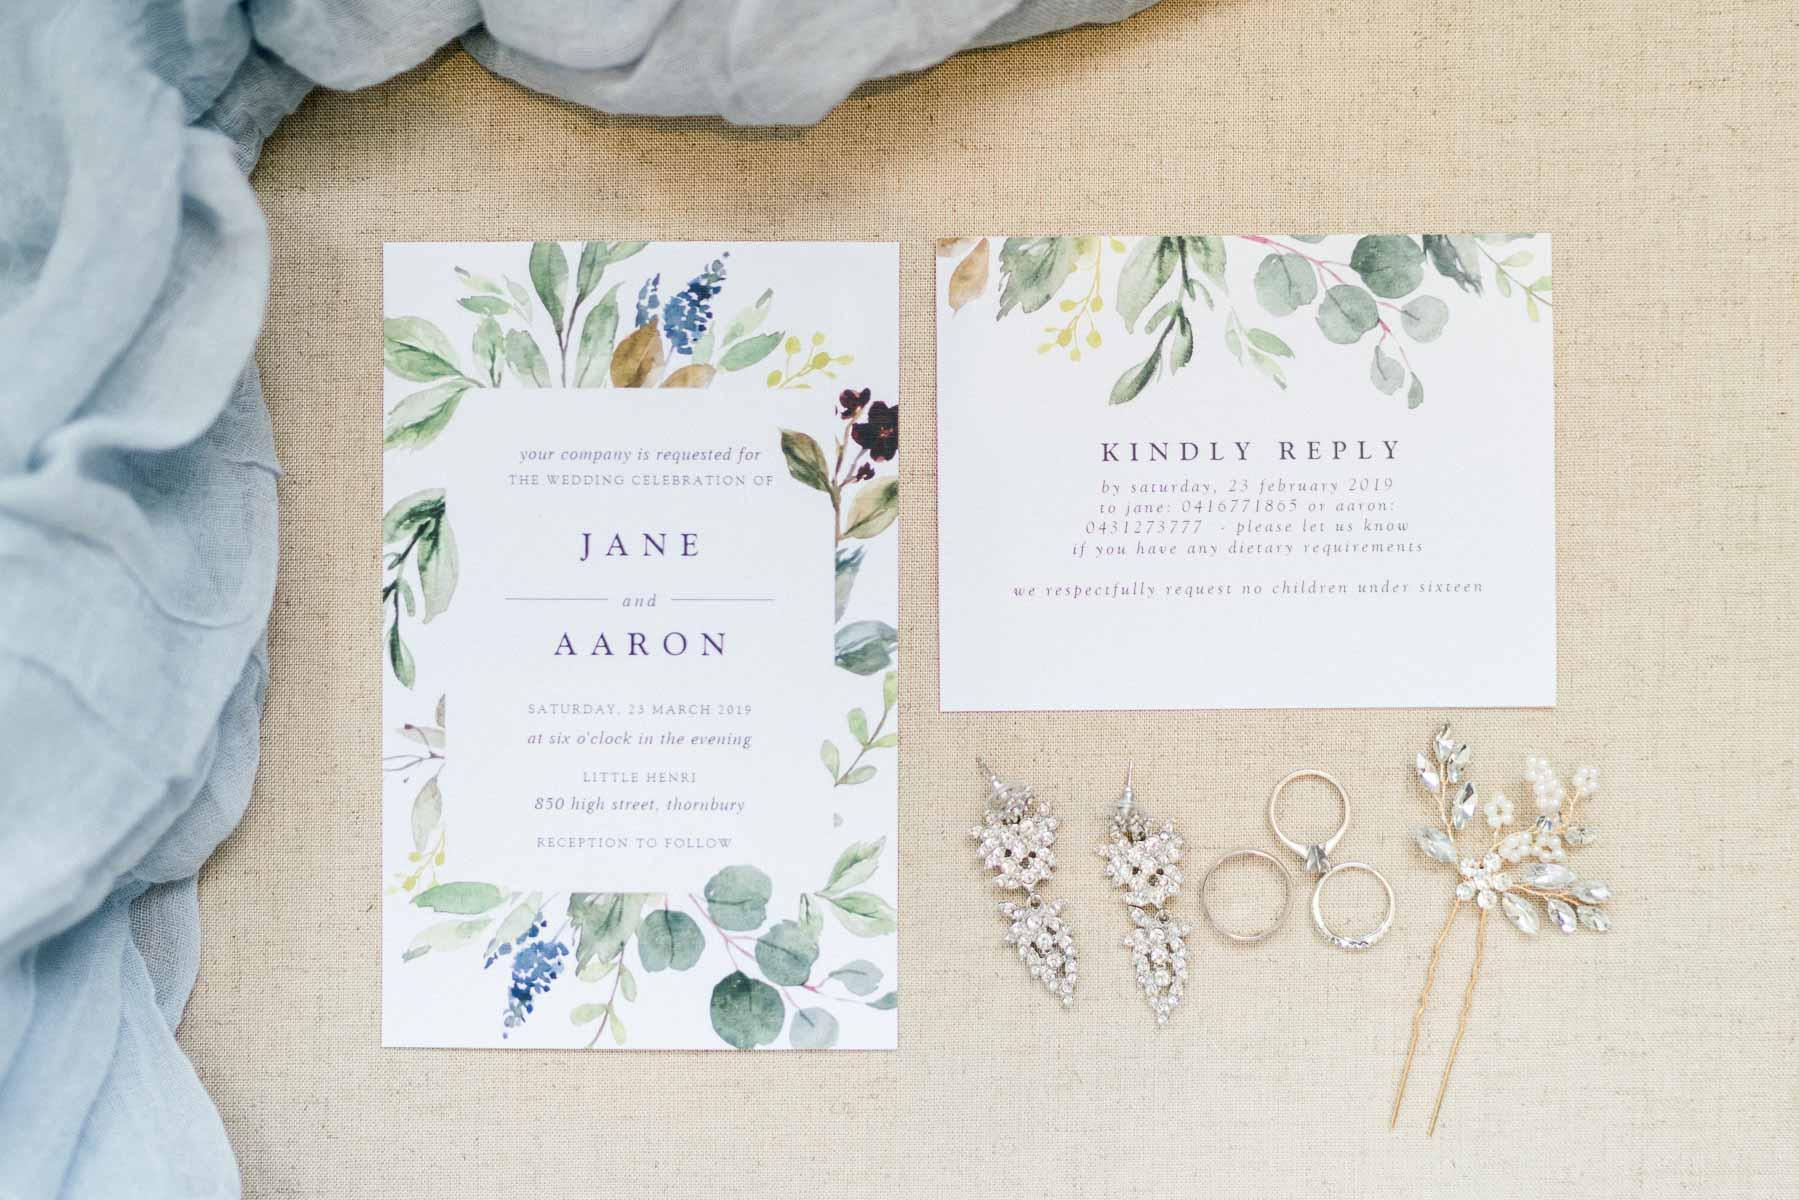 little-henri-cafe-wedding-thornbury-heart+soul-weddings-jane-aaron-04952.jpg